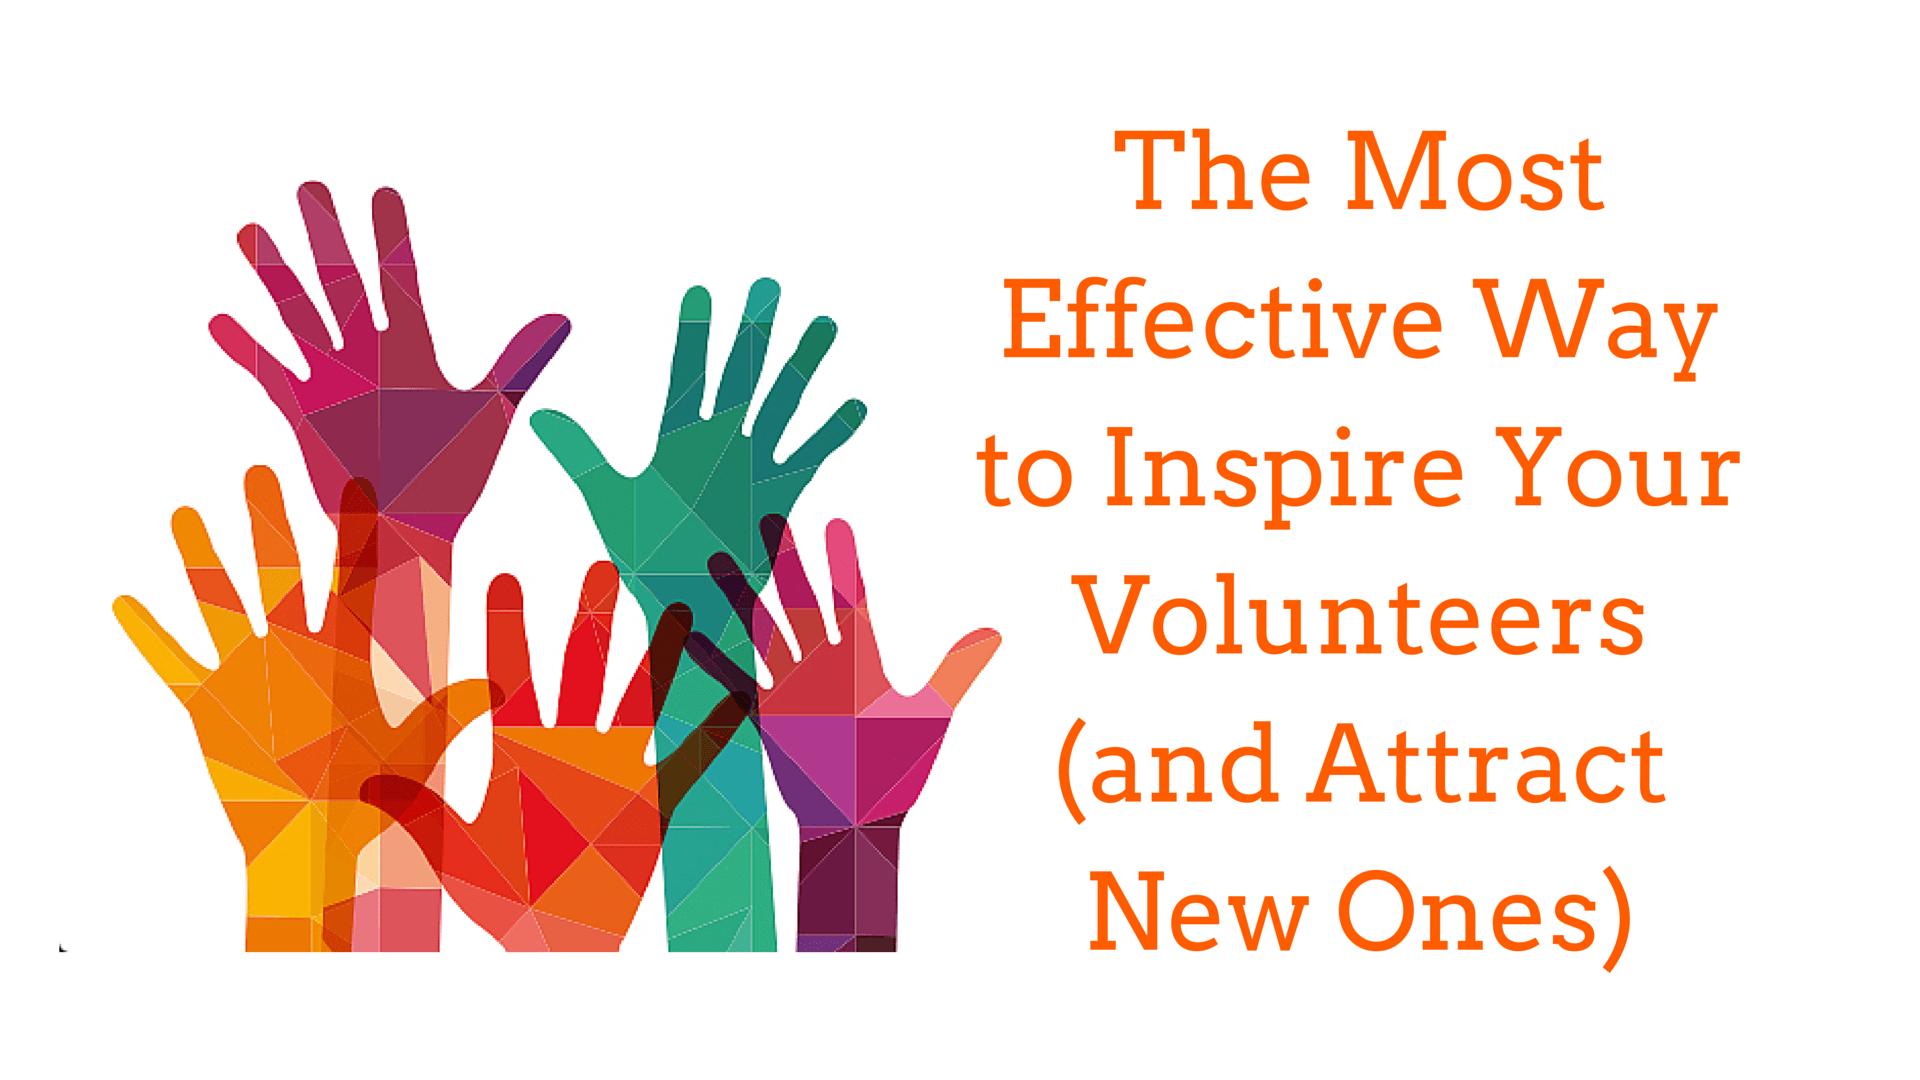 inspire and attract volunteers